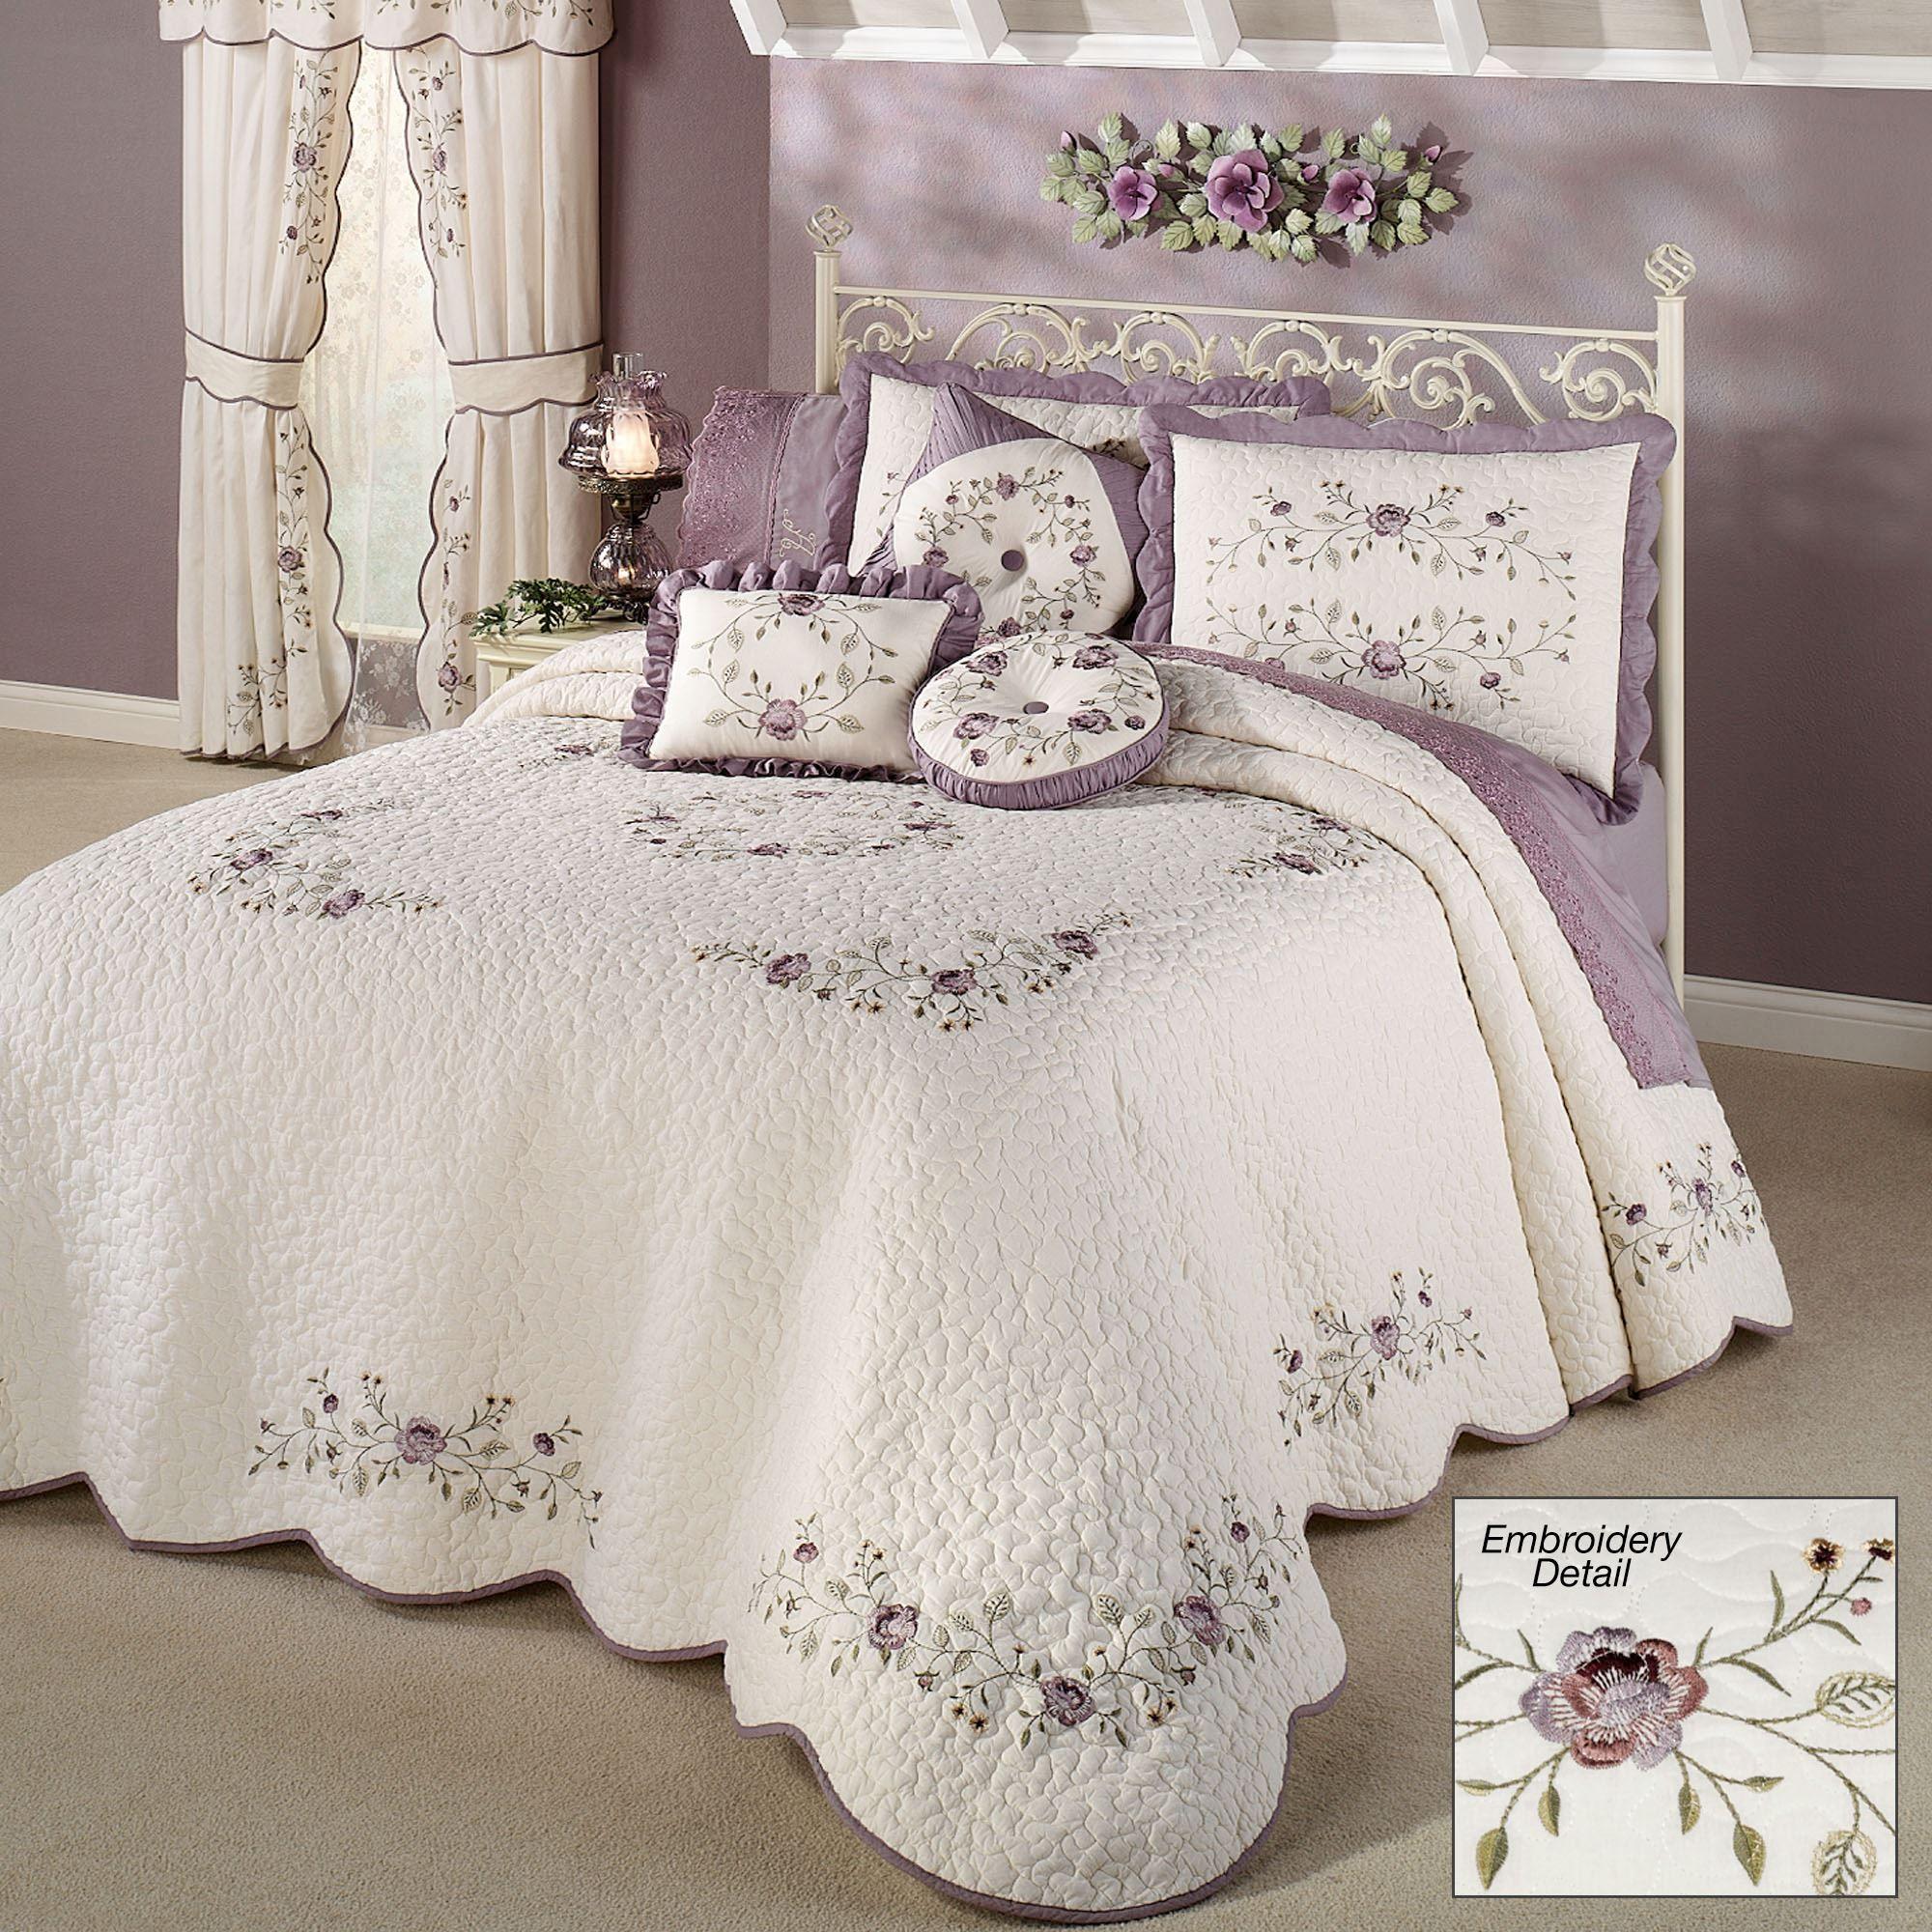 Antique Bloom Floral Oversized Quilted Bedspread Bedding